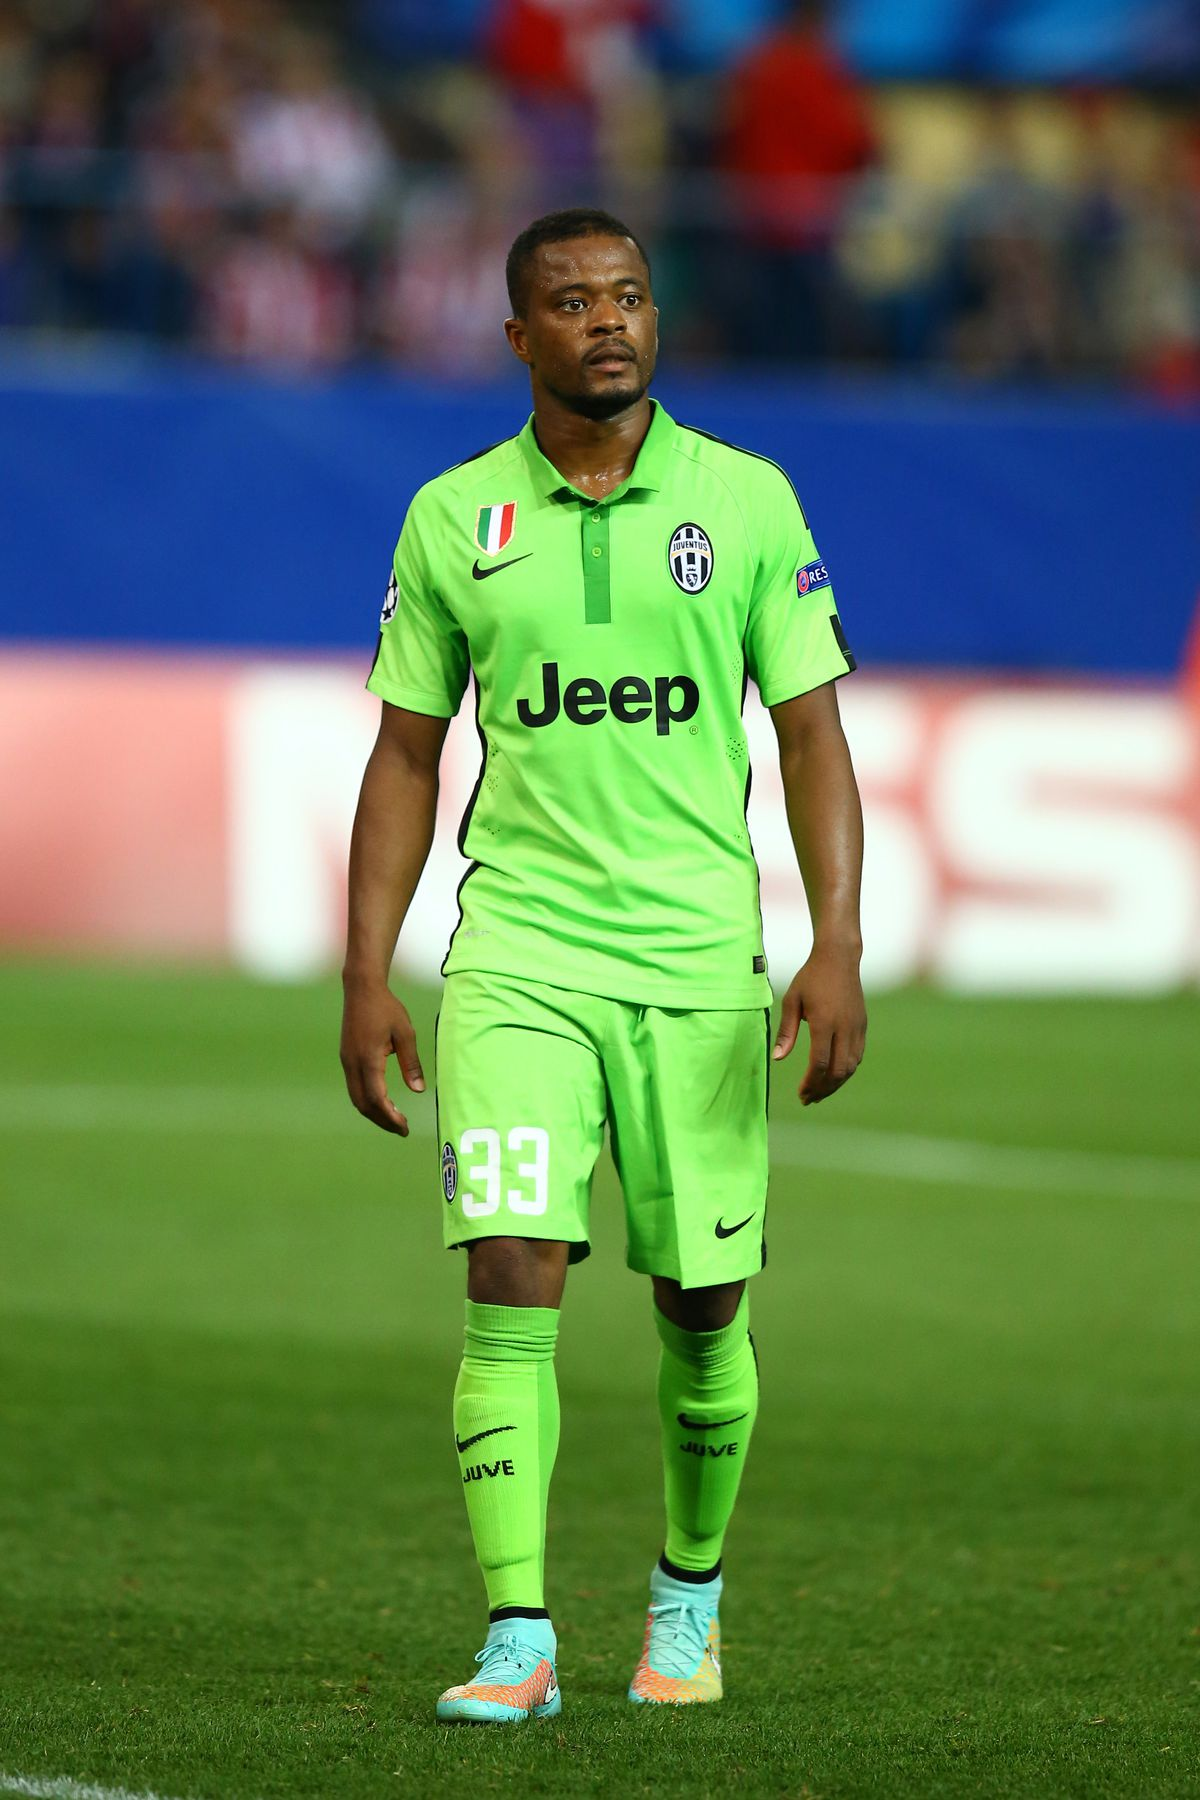 Football - UEFA Champions League - Club Atletico de Madrid vs Juventus FC